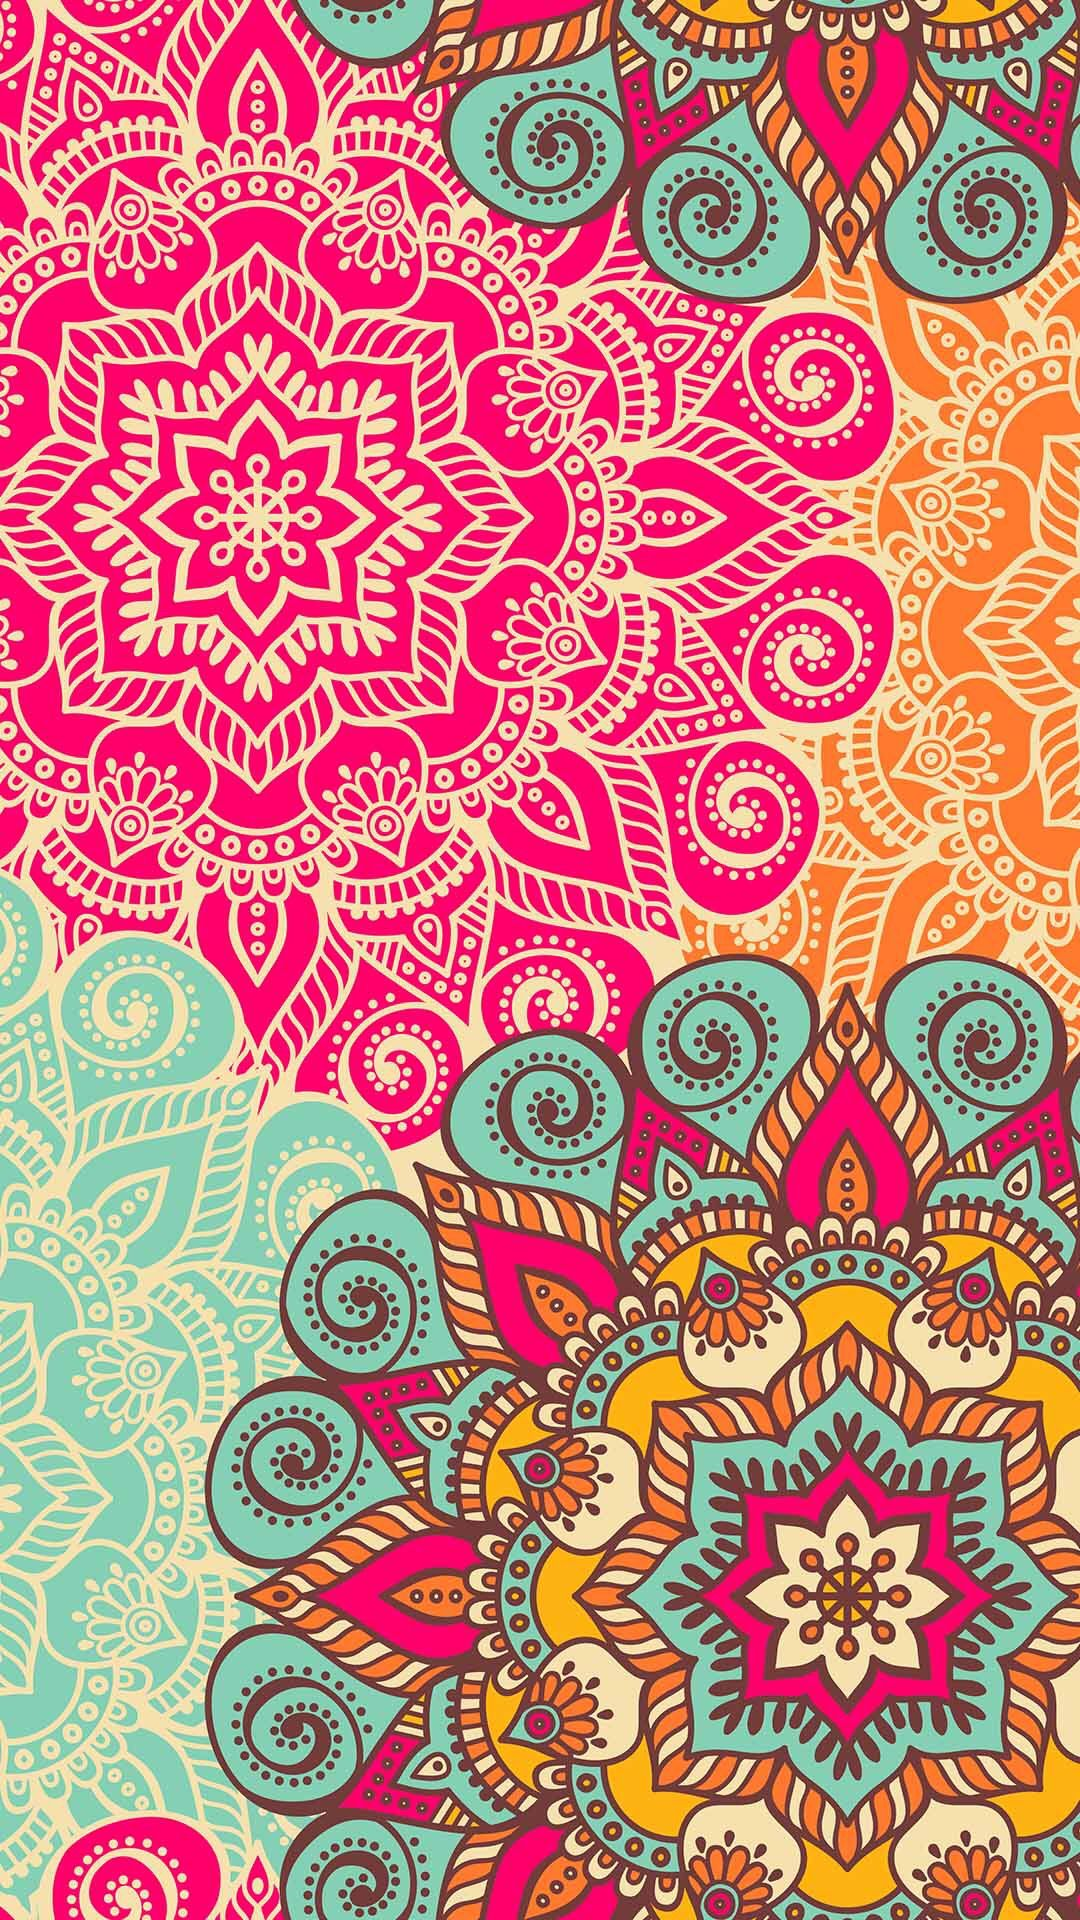 Ethnic iphone wallpaper - Resultado De Imagen Para Namaste Tumblr Background Iphone Backgroundsiphone